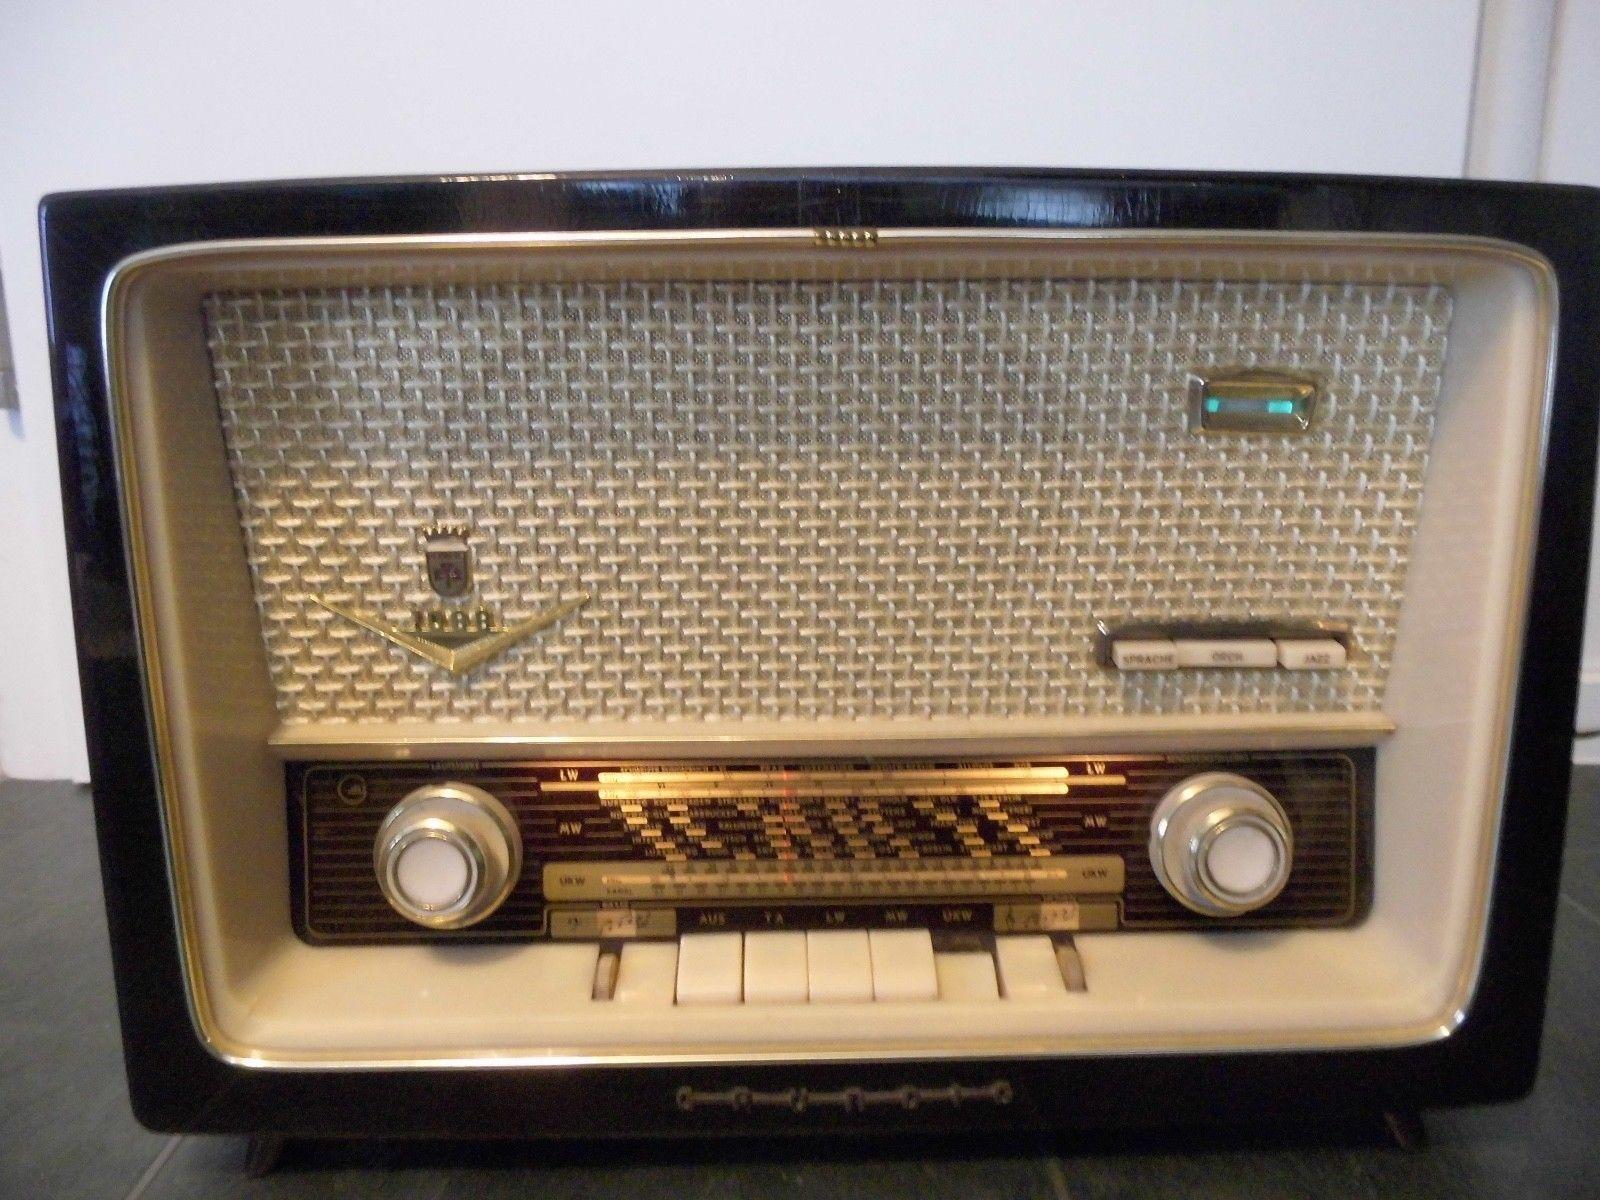 grundig typ 1088 altes radio r hrenradio musikger t. Black Bedroom Furniture Sets. Home Design Ideas